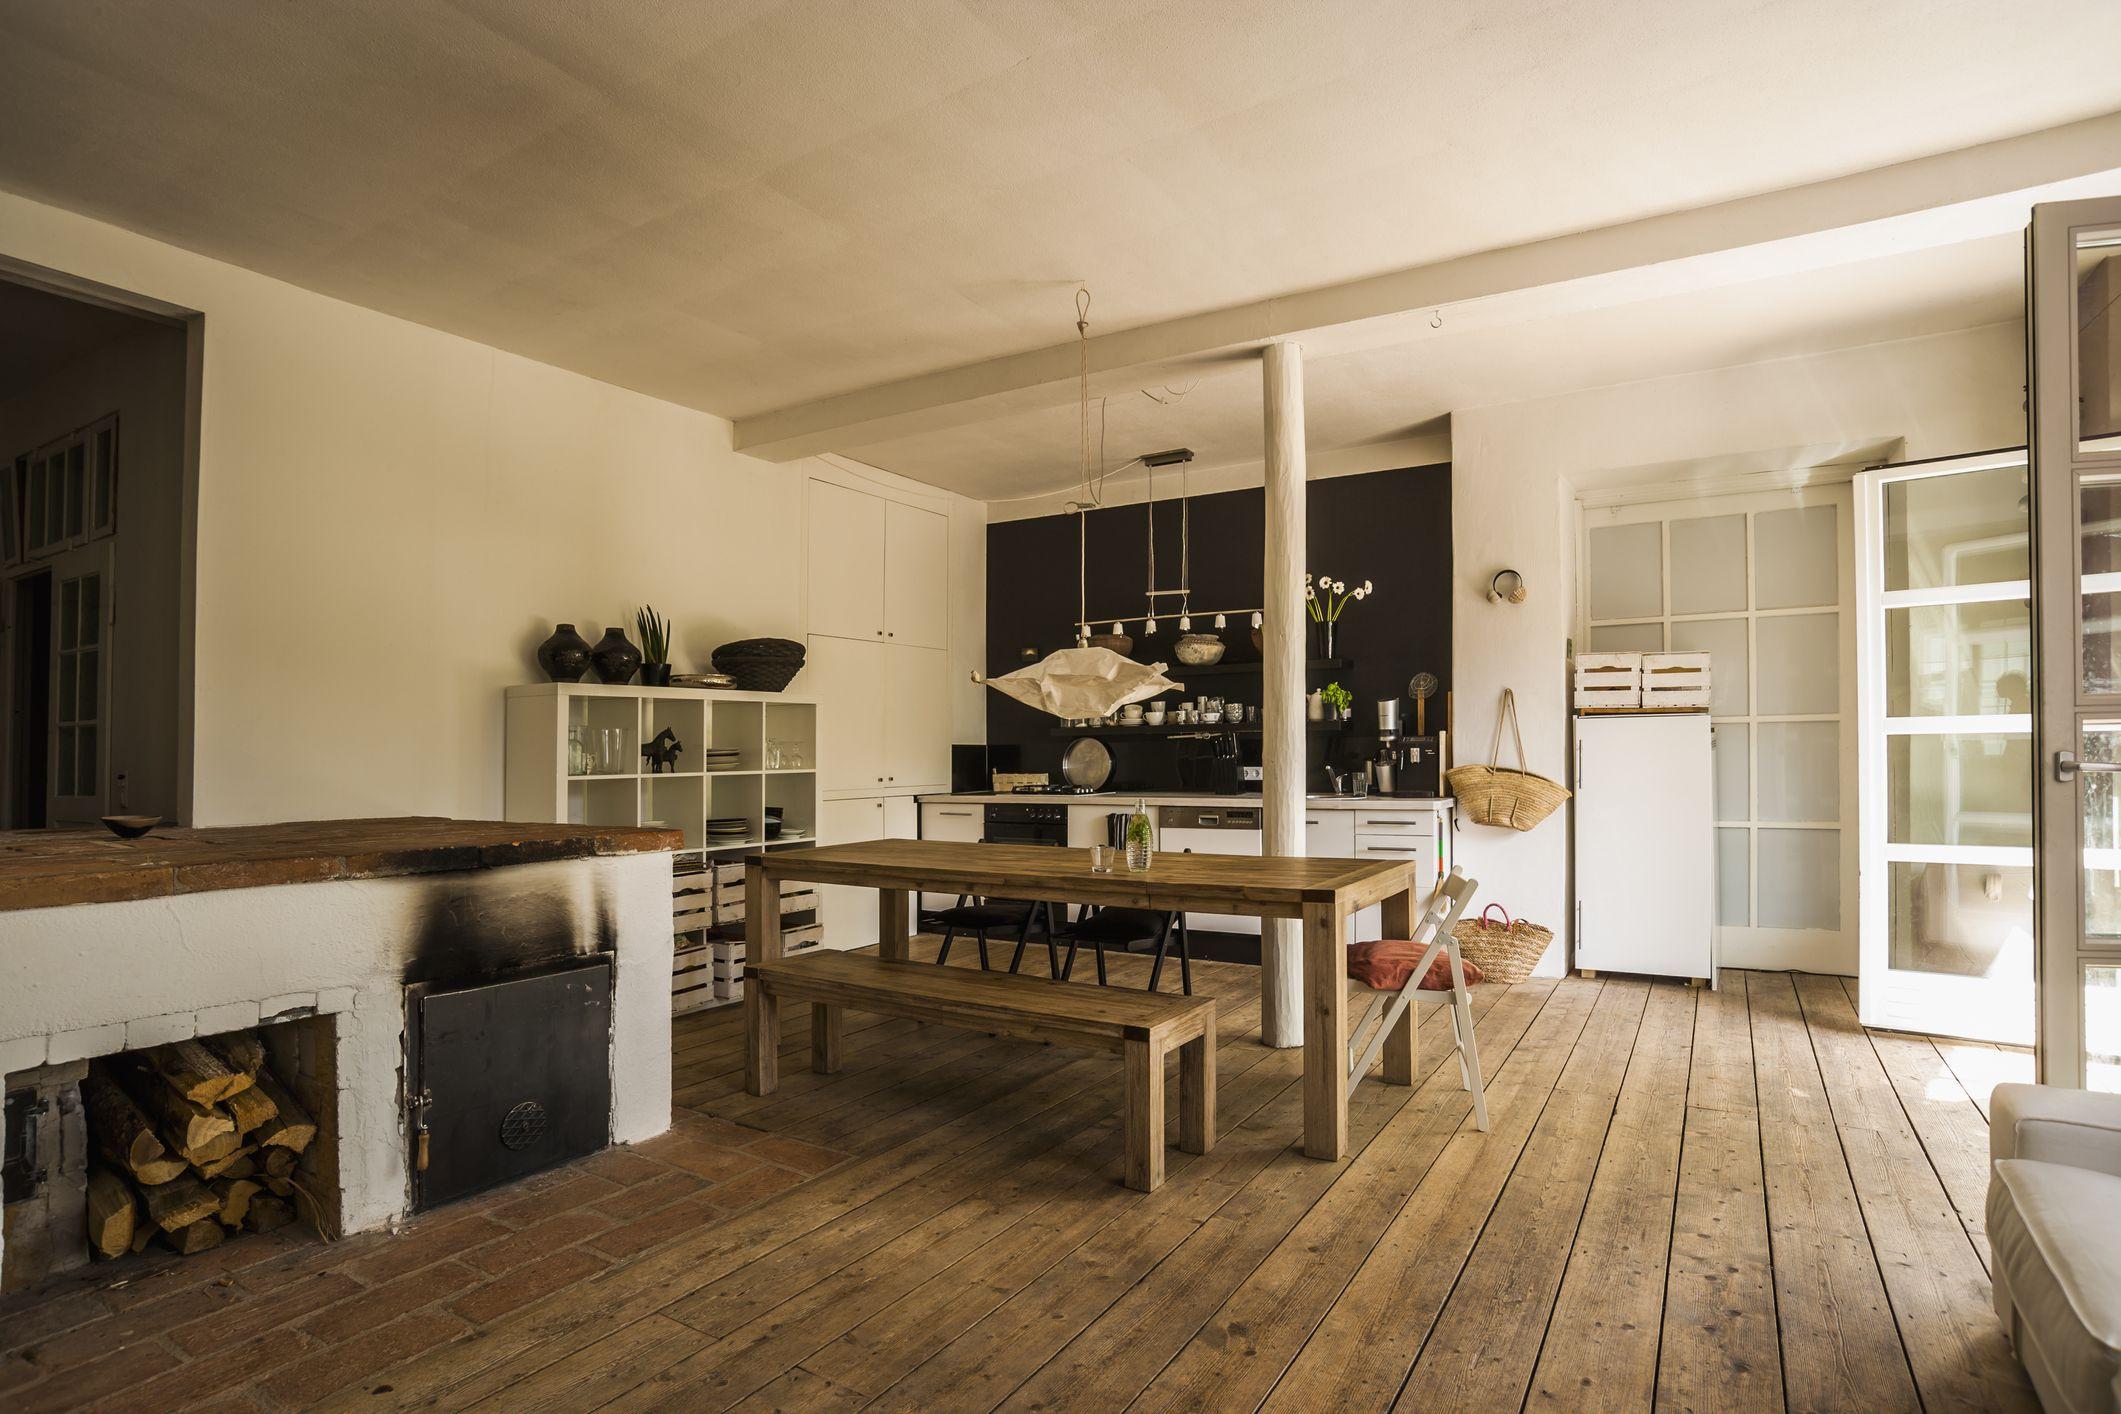 hardwood versus laminate flooring the truth of vinyl wood flooring versus natural hardwood within diningroom woodenfloor gettyimages 544546775 590e57565f9b58647043440a